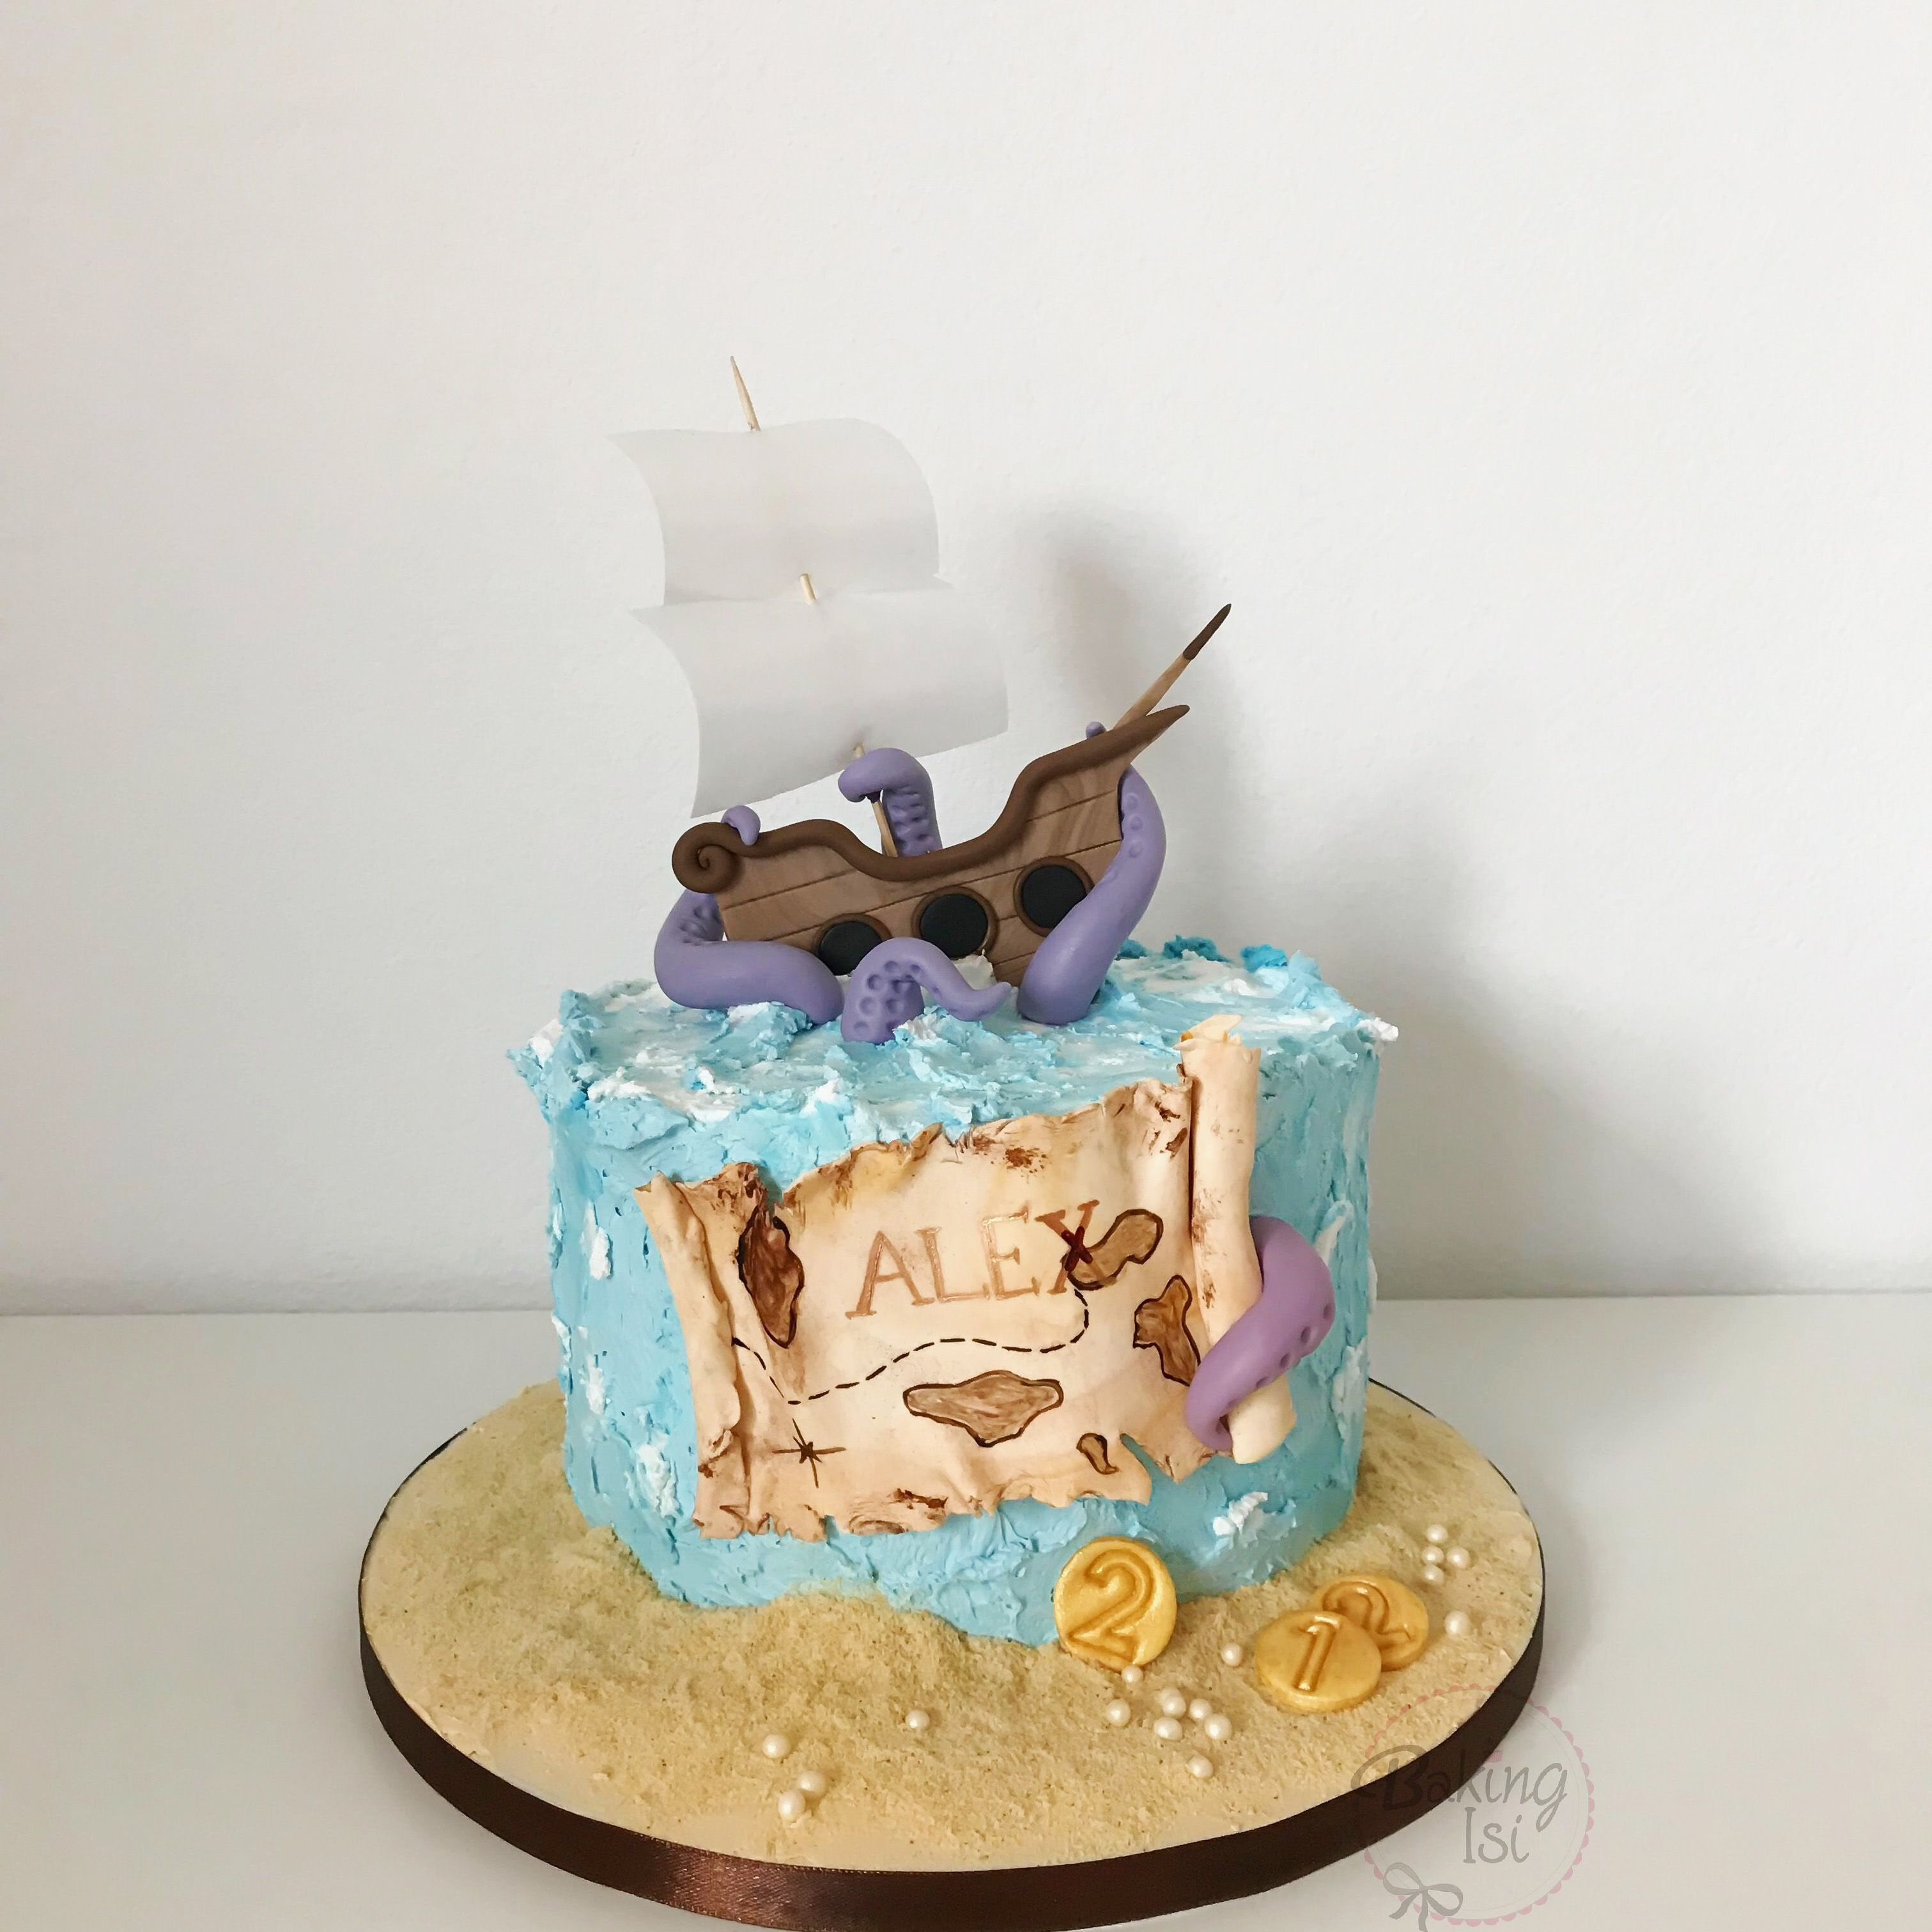 Outstanding Pirate Cake Pirat Piraten Boy Boys Cake Sea Ship Treasure Birthday Cards Printable Inklcafe Filternl